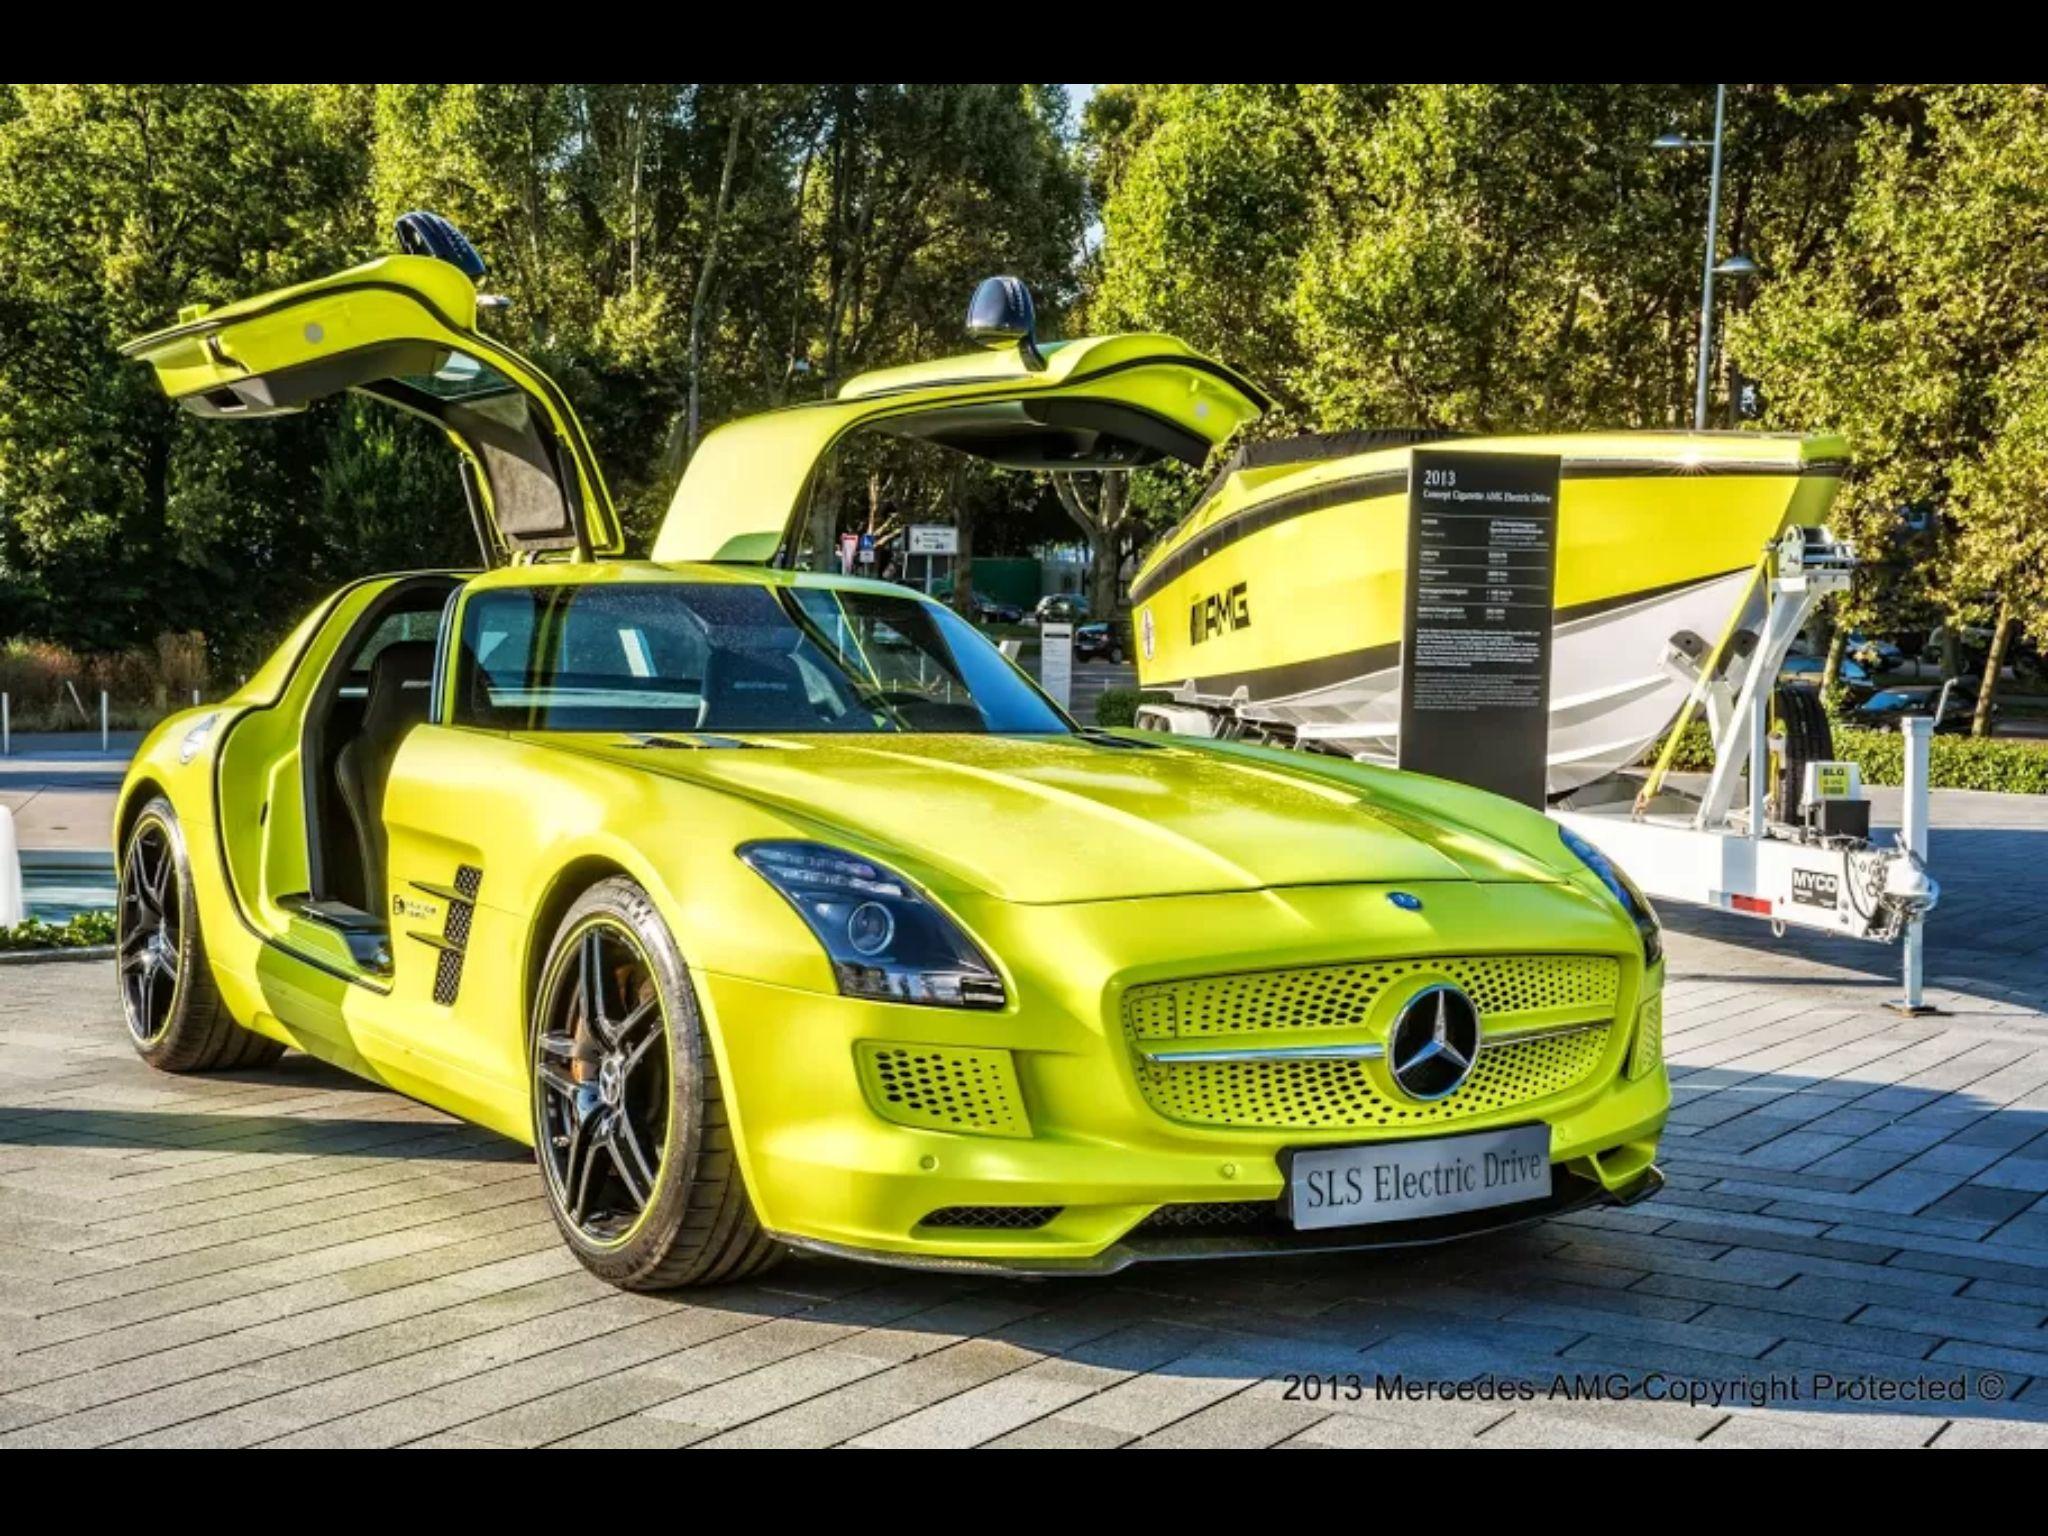 Electric Sls And Amg Race Boat Mercedes Sports Car Mercedes Mercedes Benz Amg